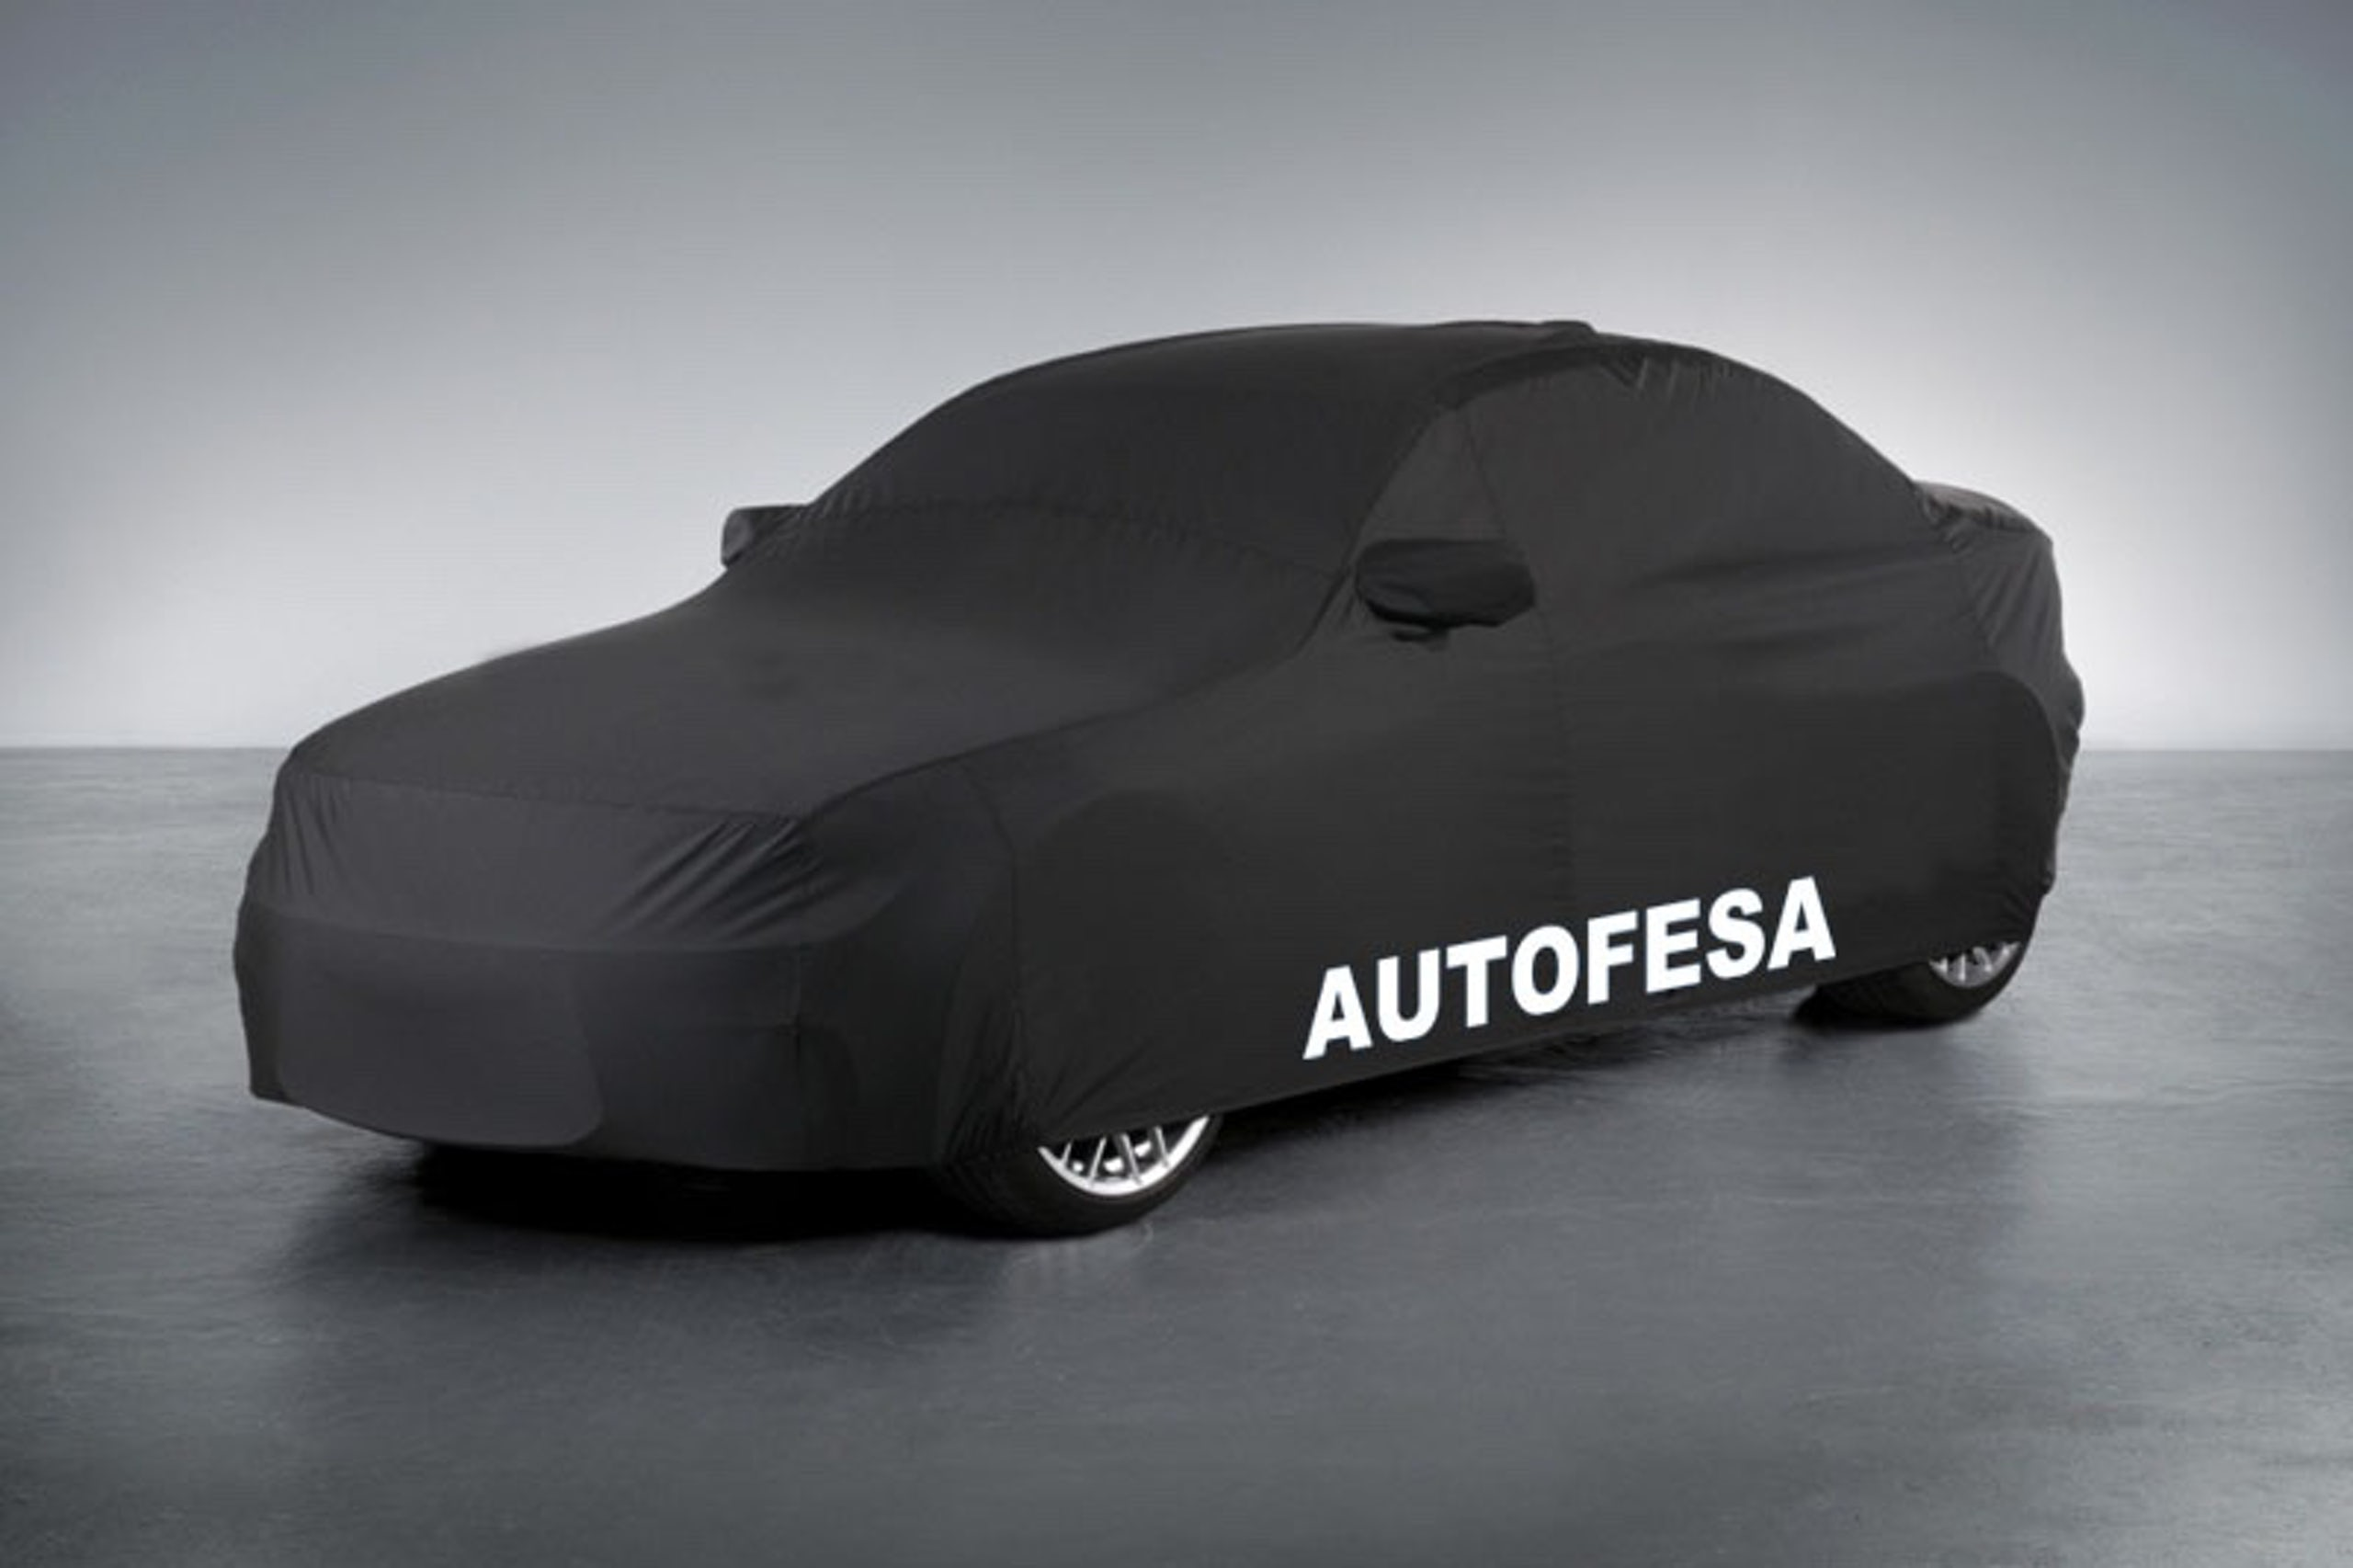 Ford Mondeo 2.0 TDCi 150cv Trend 5p Powershift Auto S/S - Foto 20